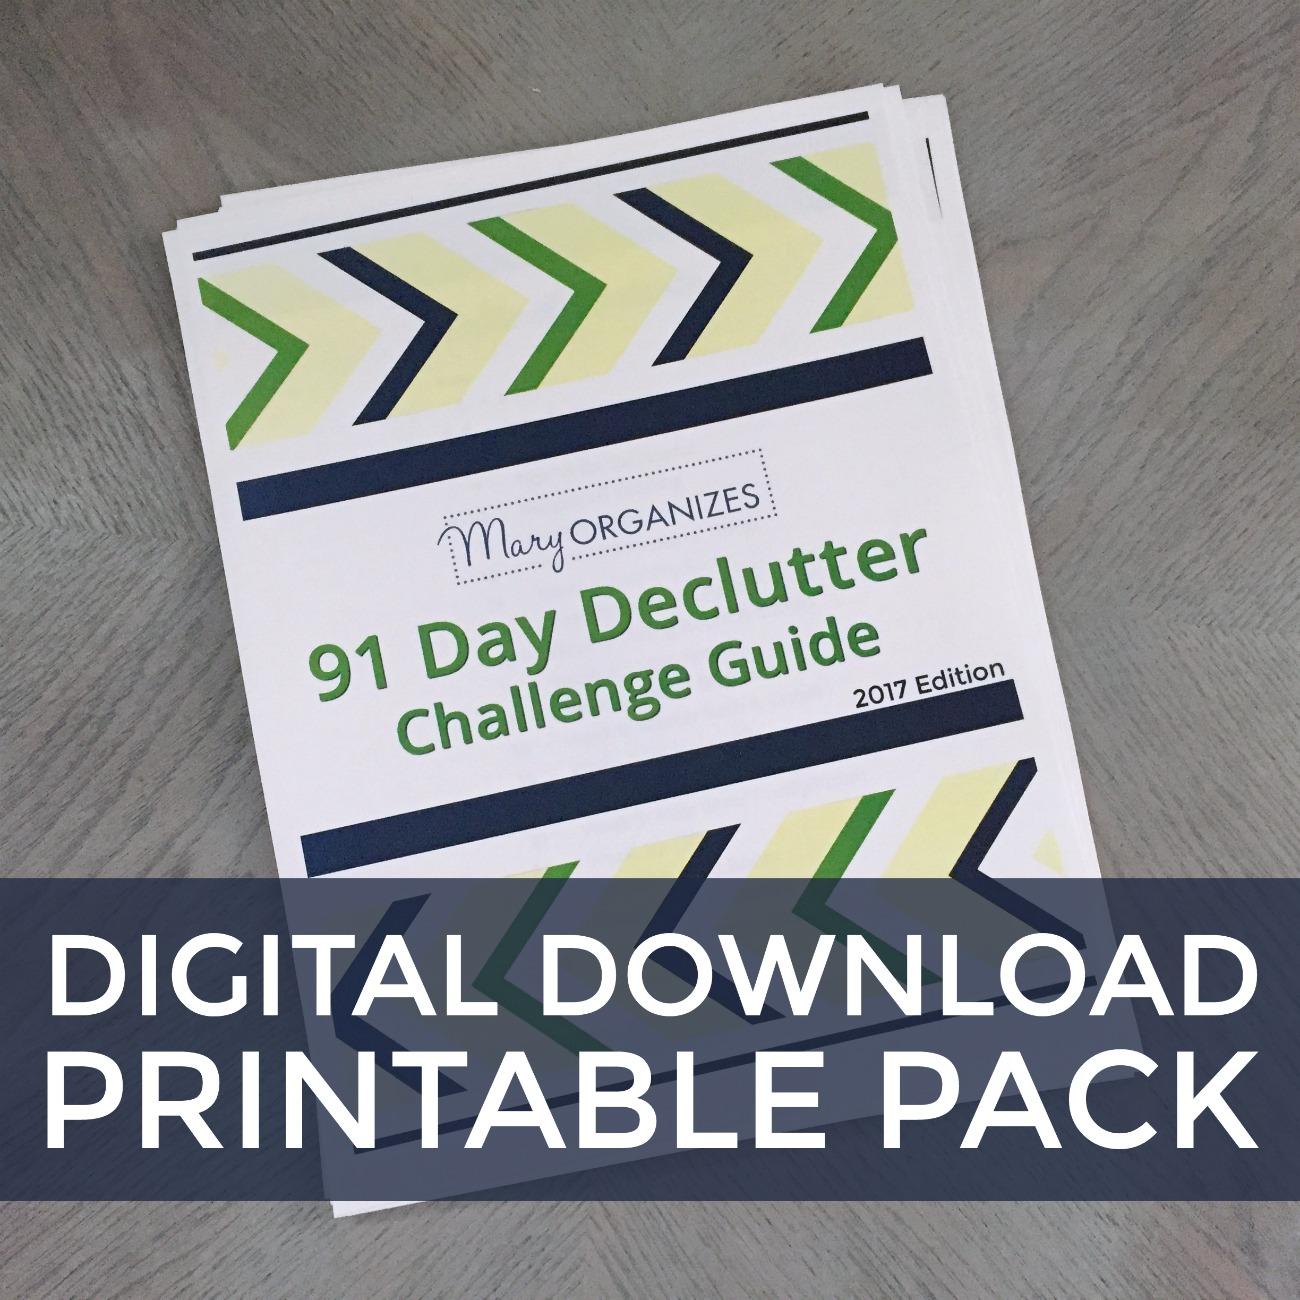 digital-download-printable-pack